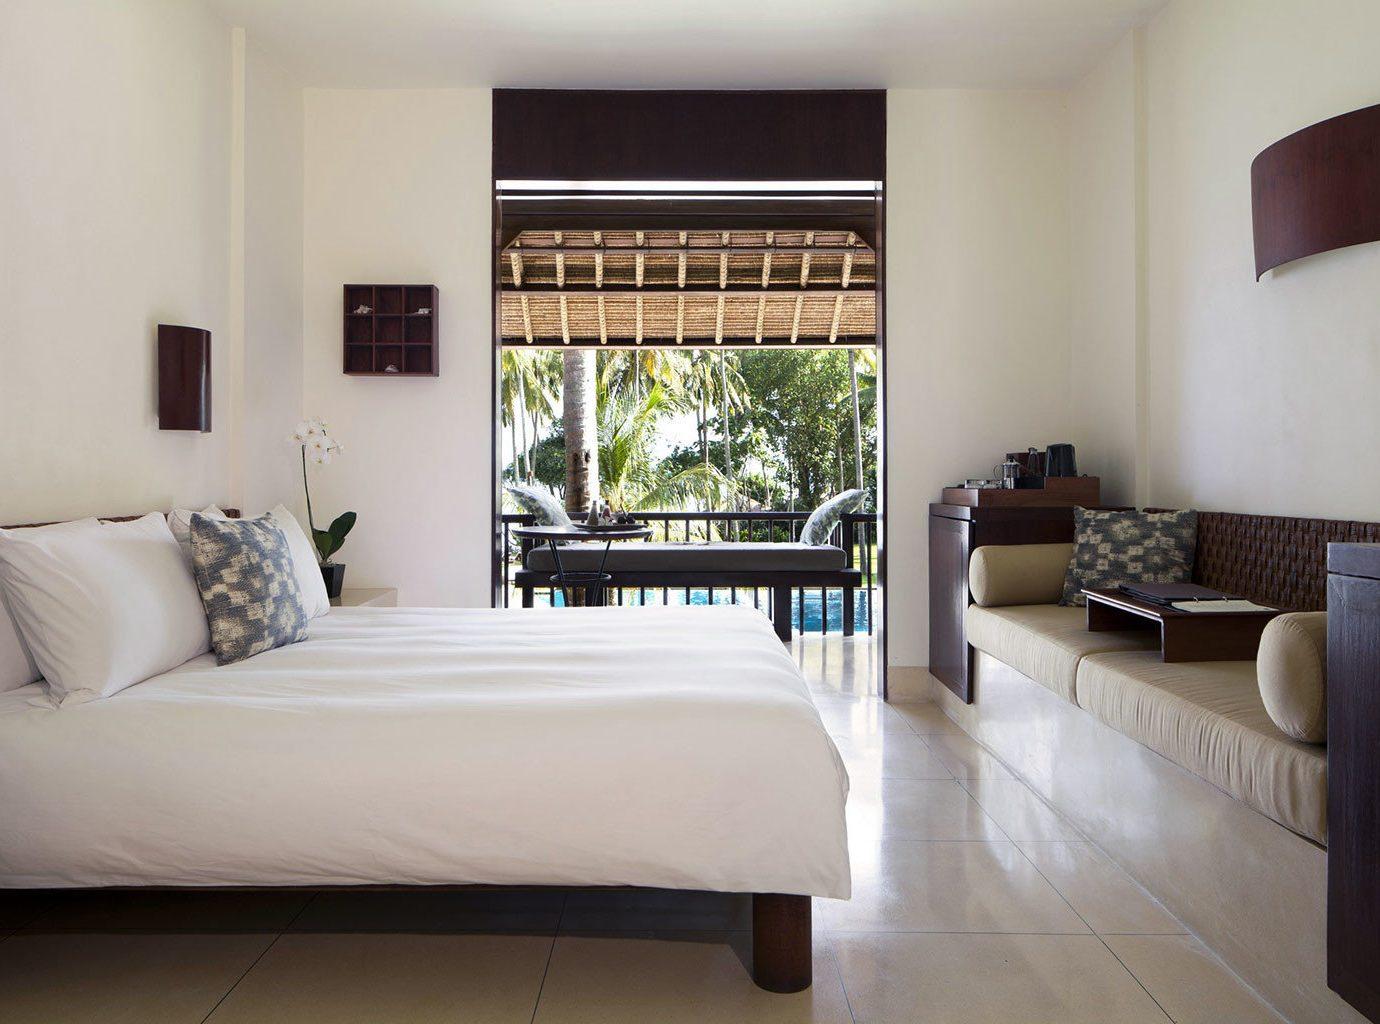 sofa property Bedroom living room home Suite hardwood condominium Villa cottage